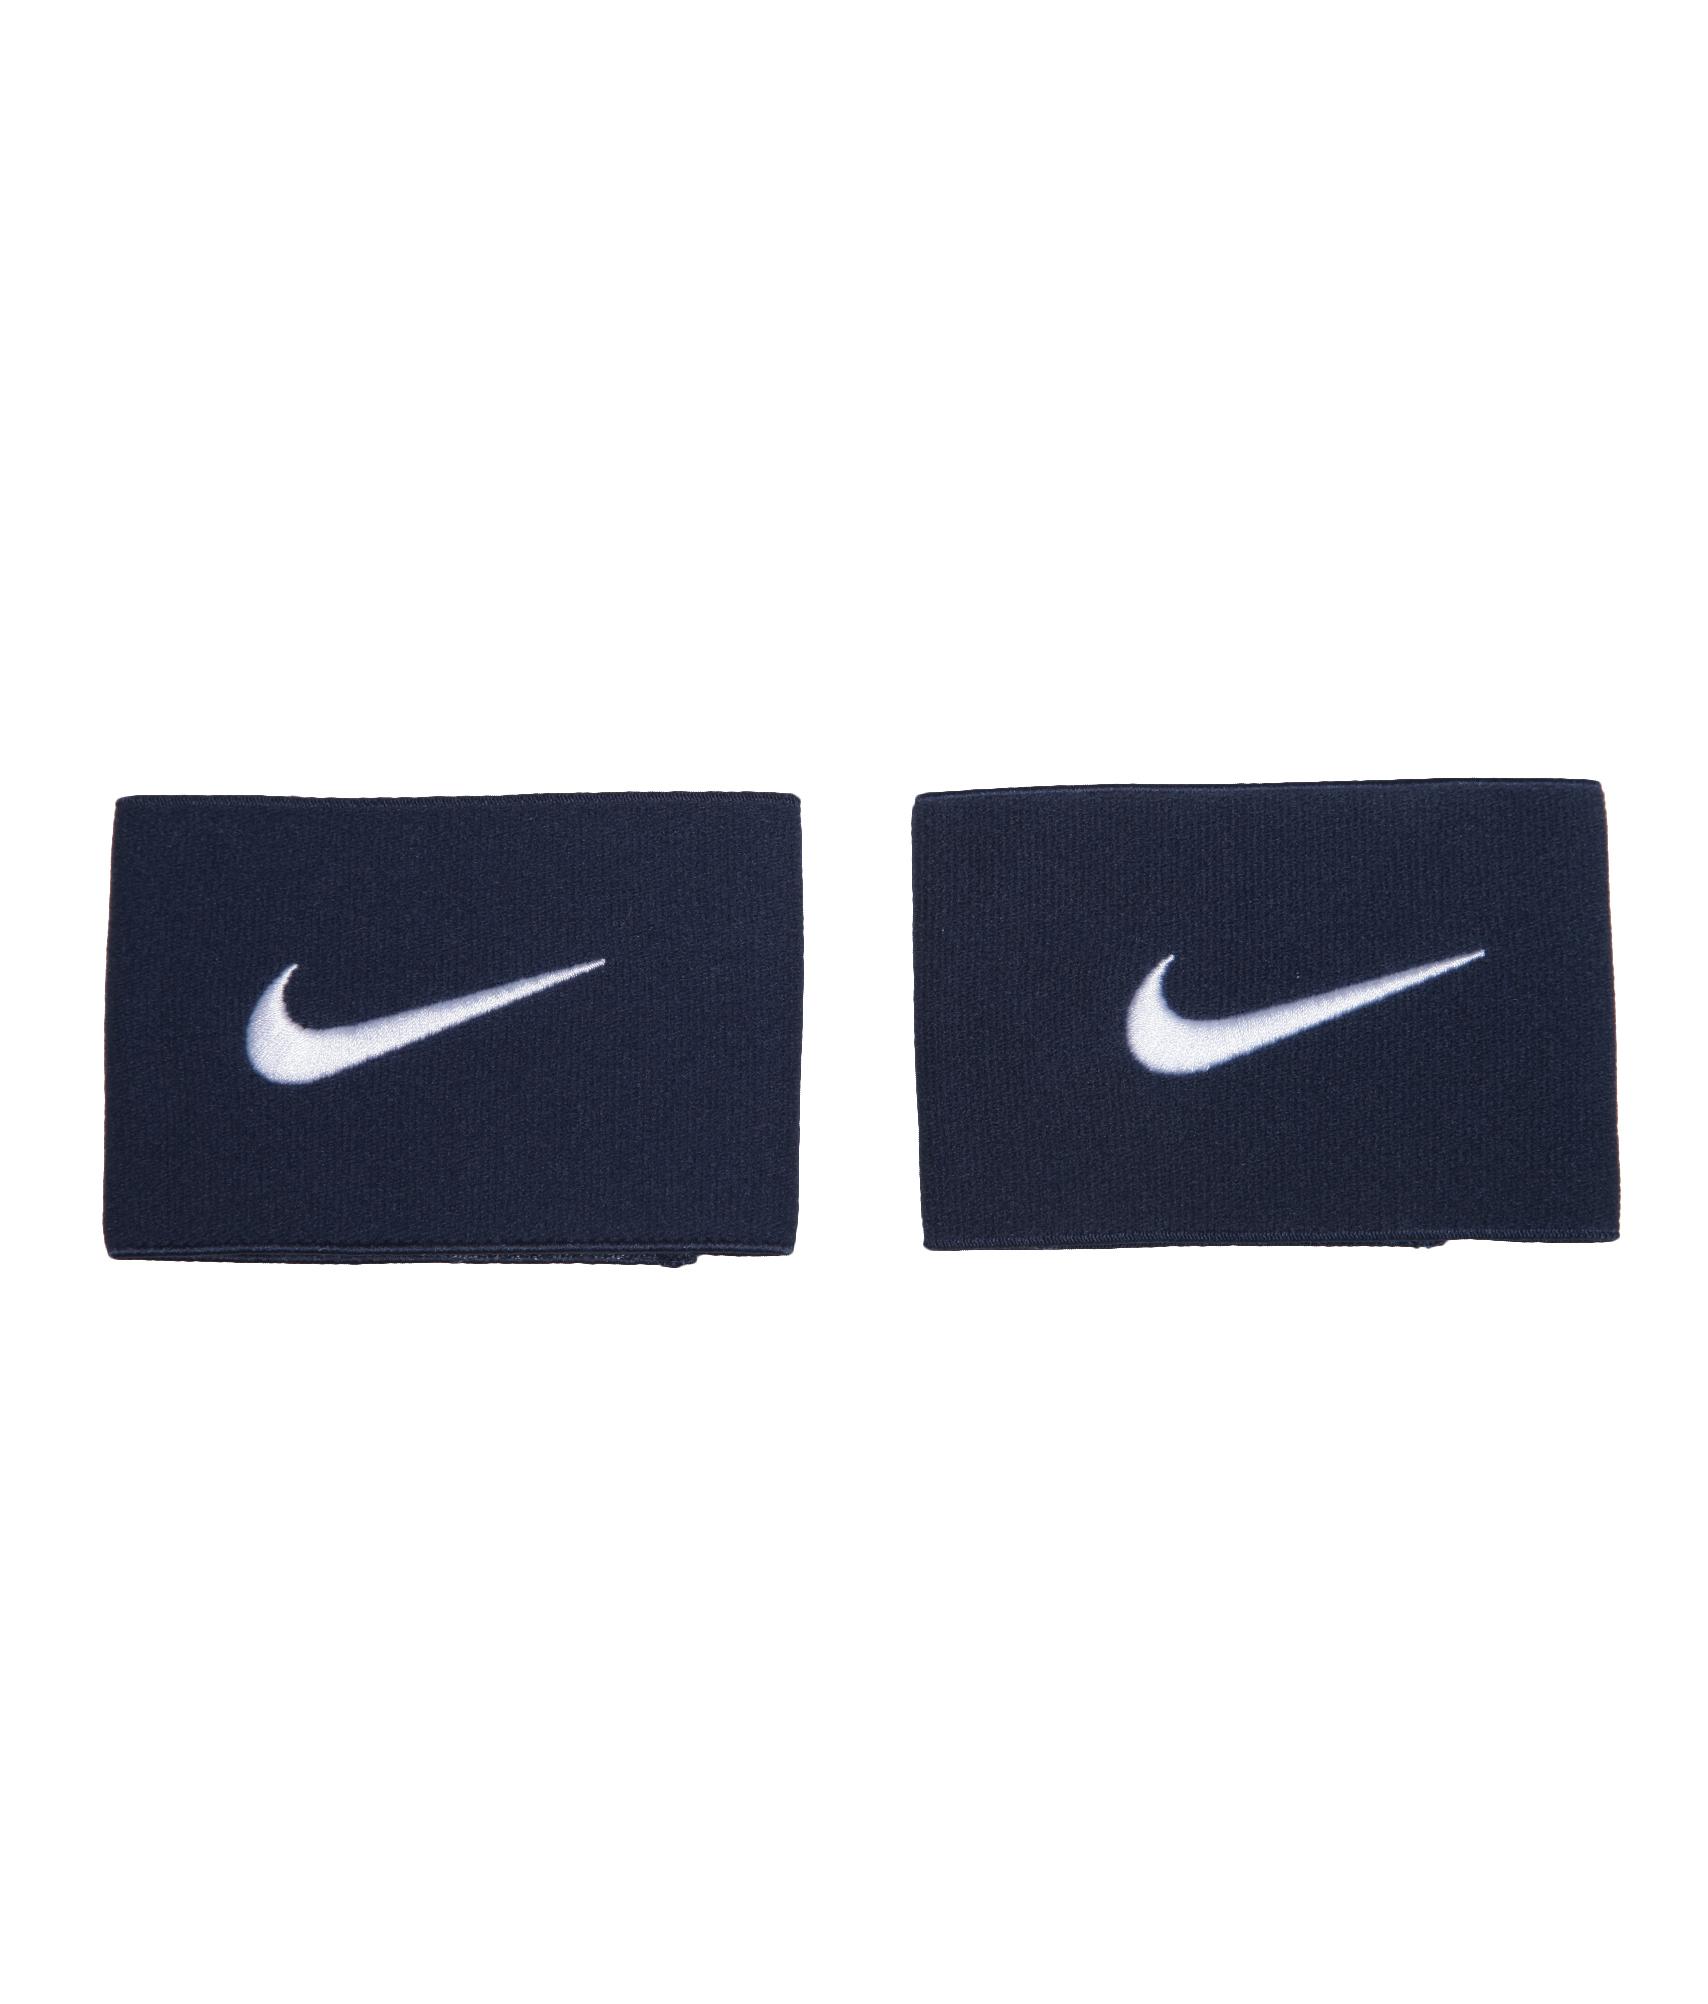 Фиксатор для щитков Nike Зенит Цвет-Синий чулок д щитков nike guard lock elite sleeve su12 se0173 011 l чёрный